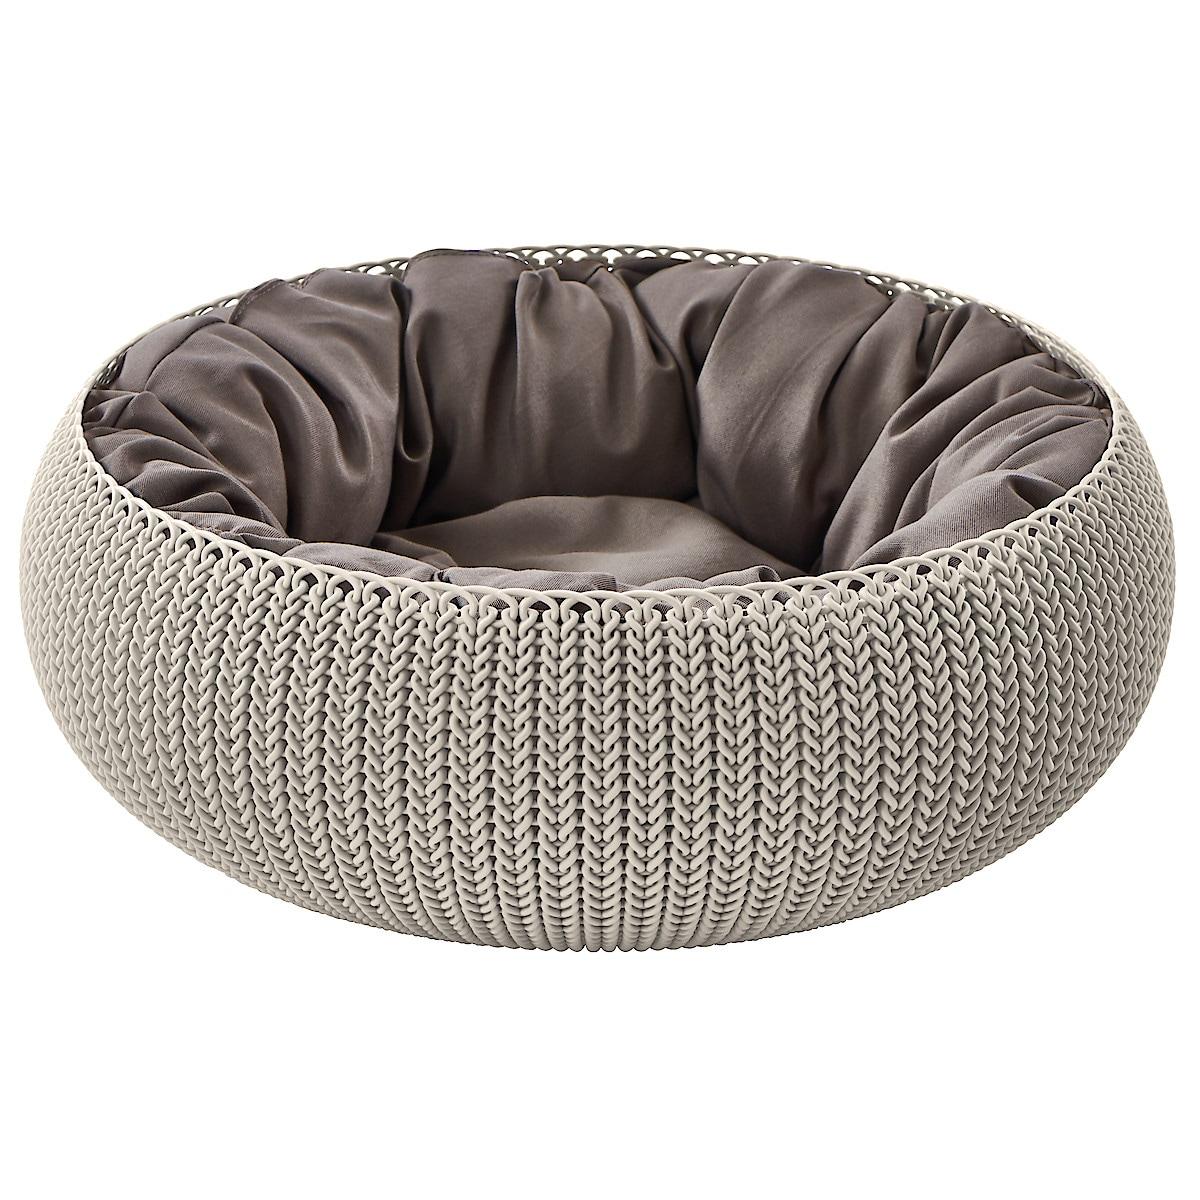 Djurbädd Curver Cozy Pet Bed